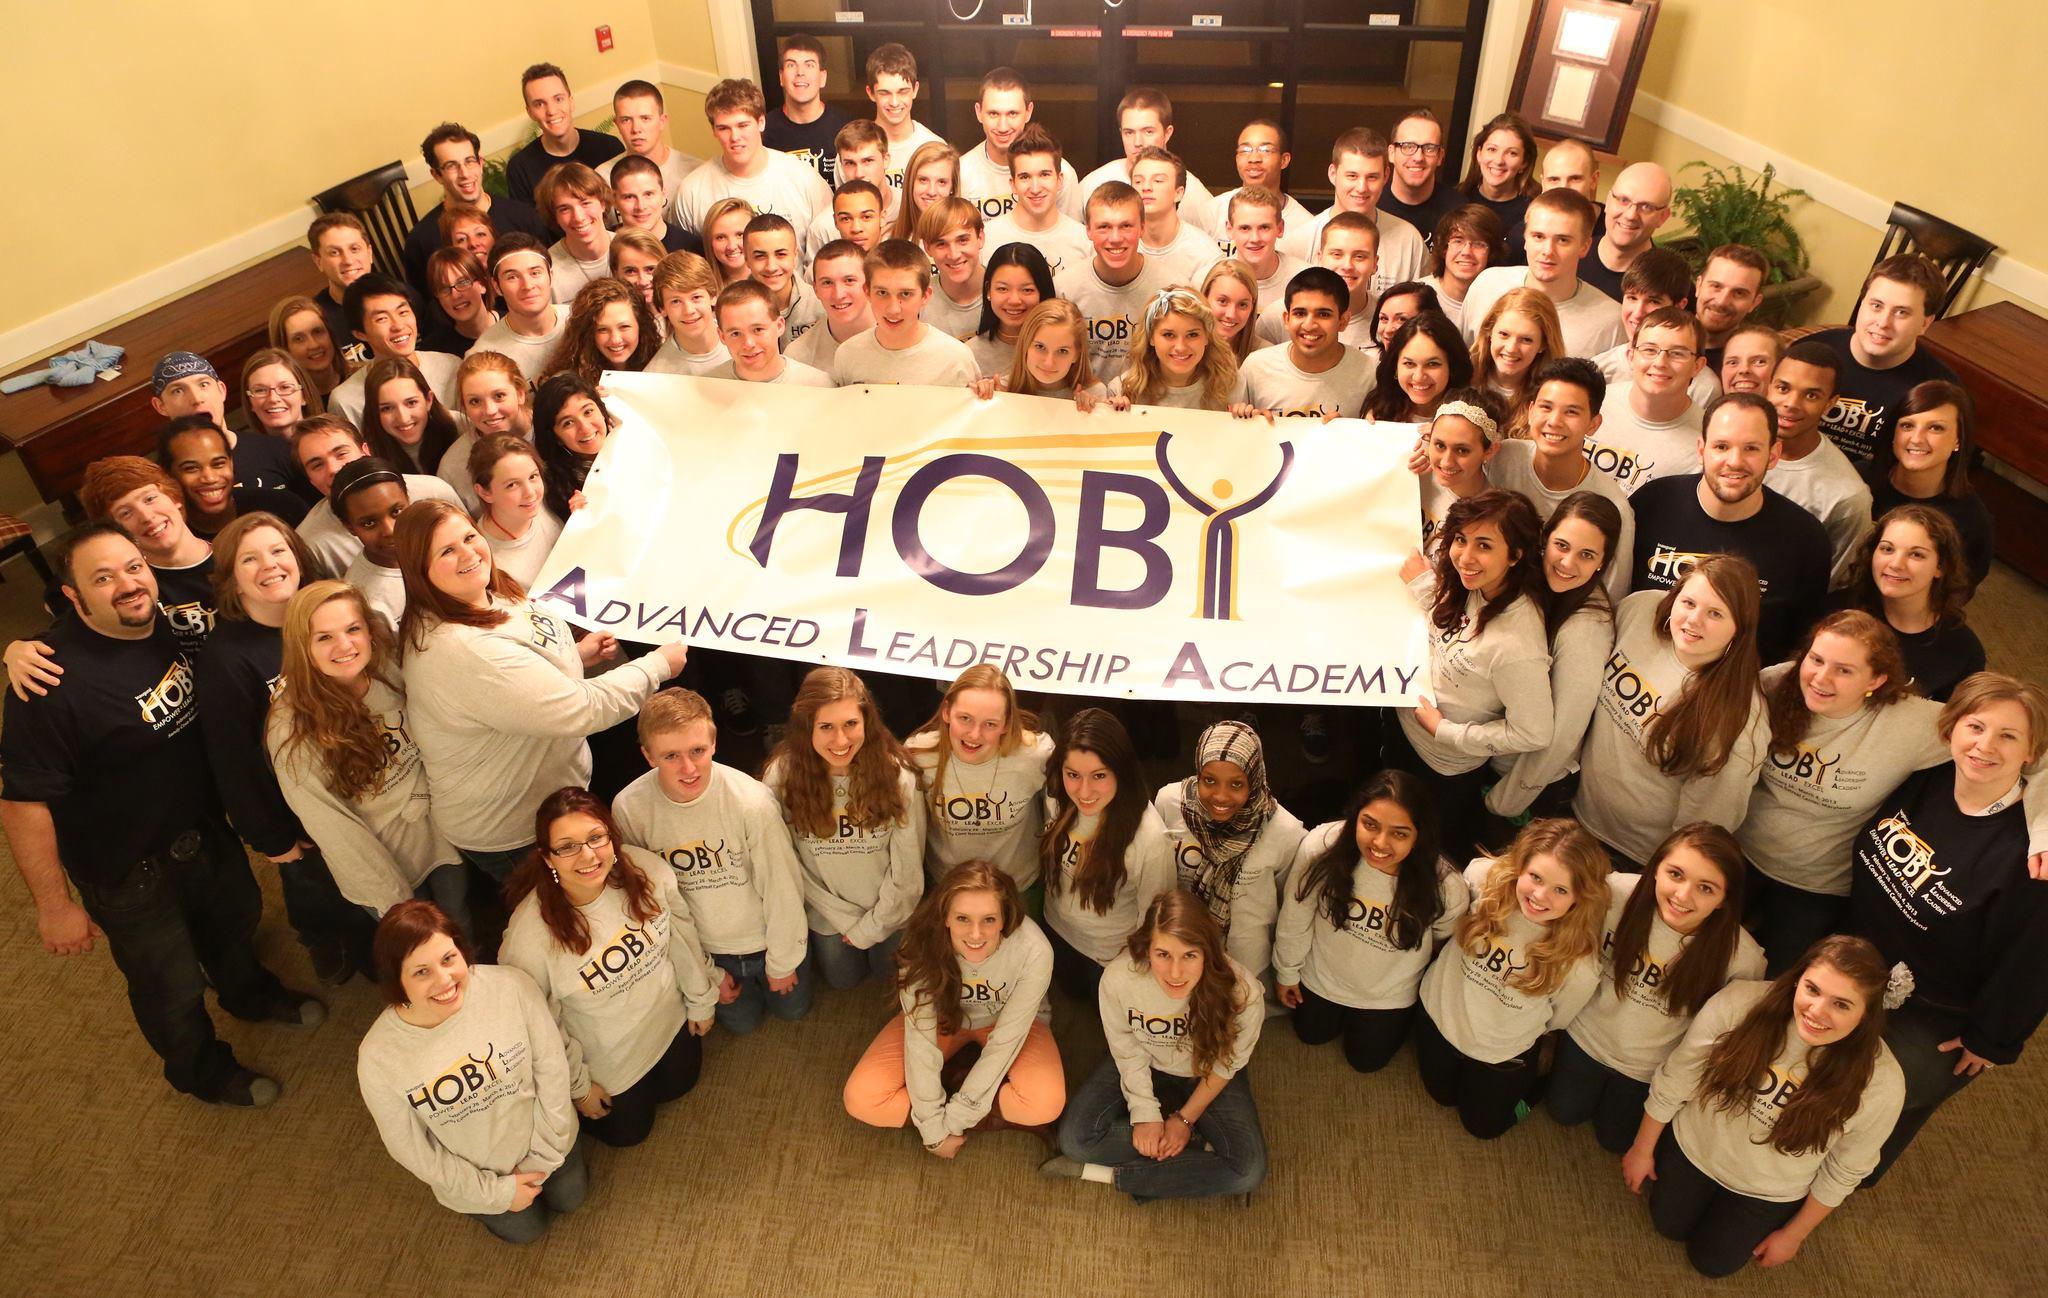 2013 HOBY Advanced Leadership Academy